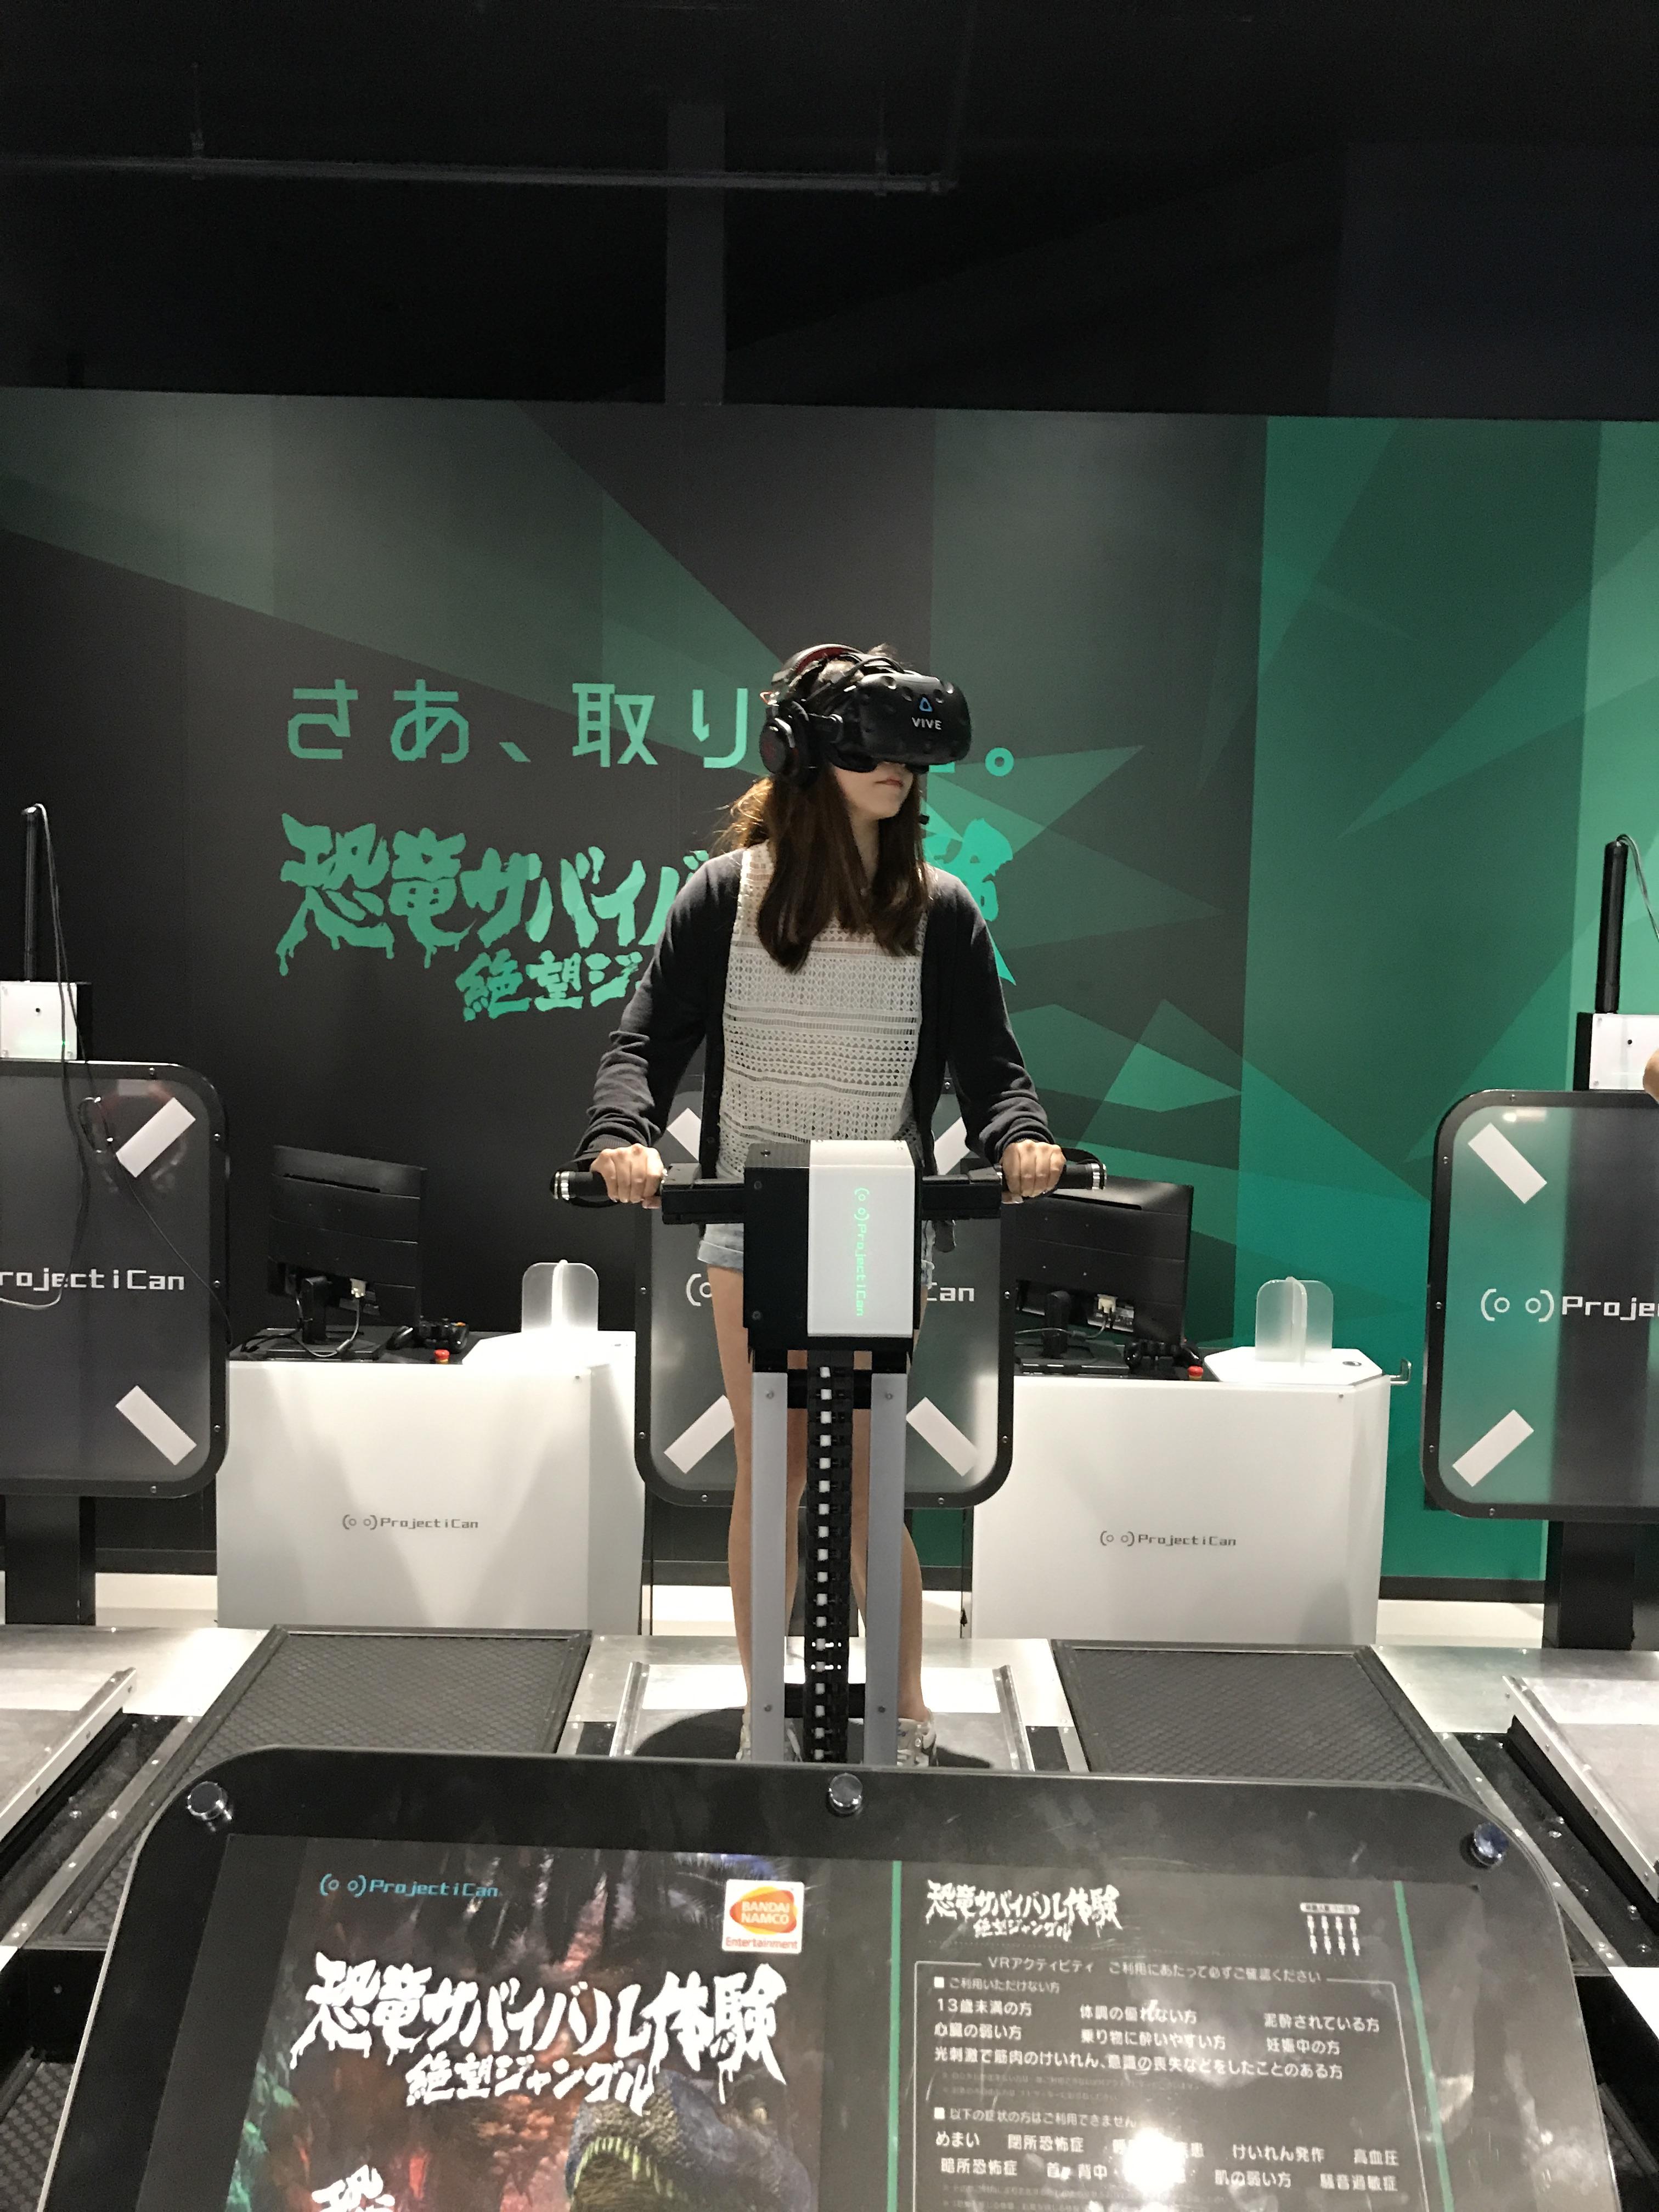 VR ZONE Shinjuku 新宿に来たら新感覚ゲームセンターへ!どのアトラクション体験にする?チケット情報@新宿